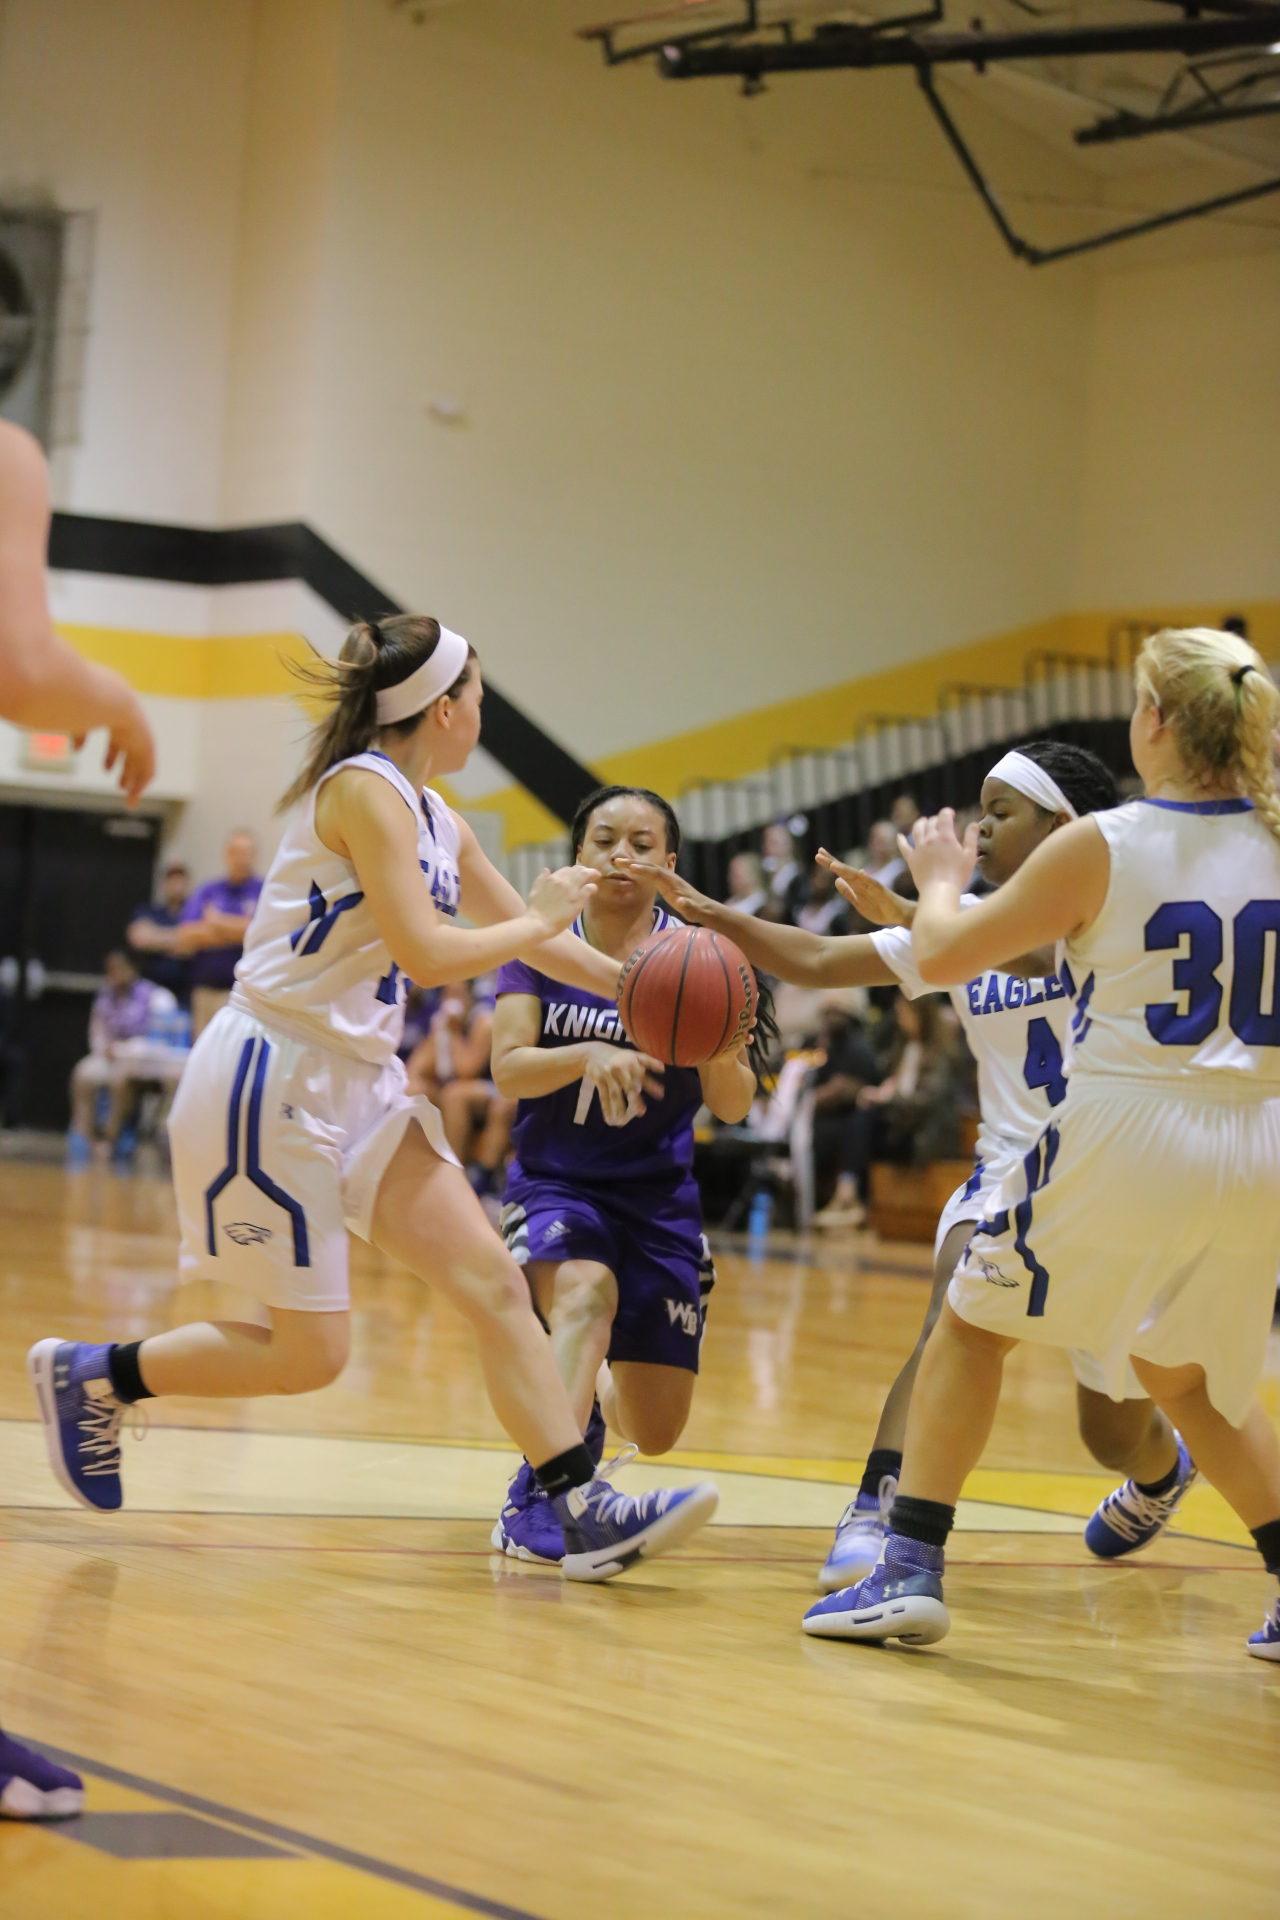 West Bladen vs East Bladen girls playoff basketball 4